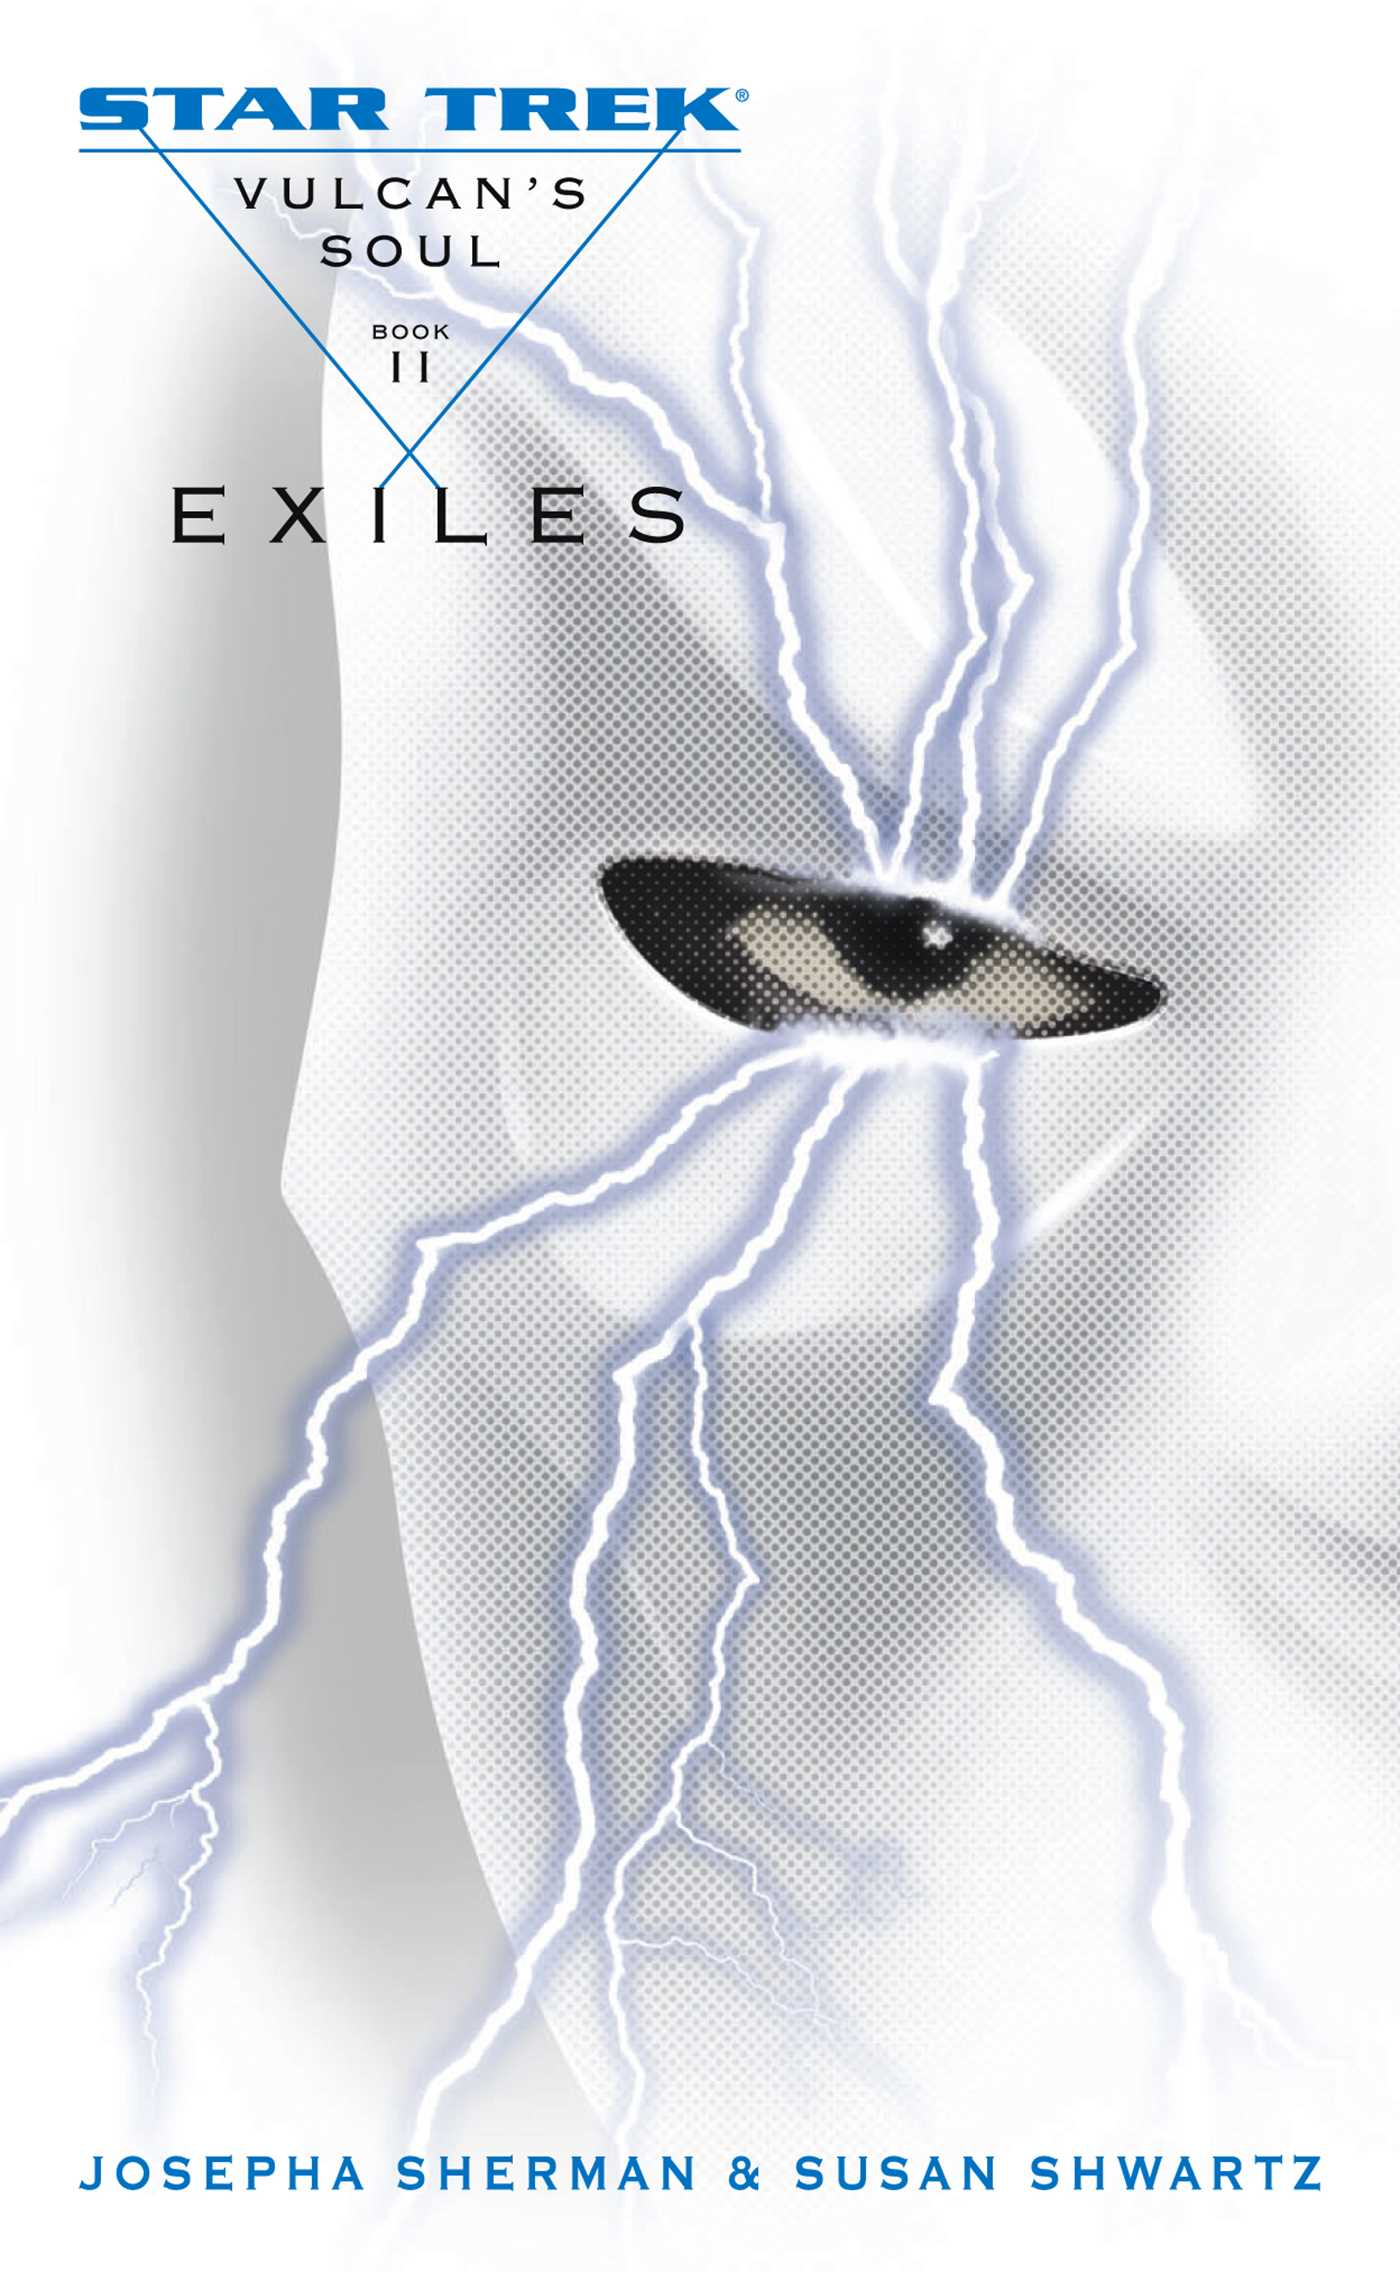 Star trek the original series vulcans soul 2 exiles 9780743463614 hr